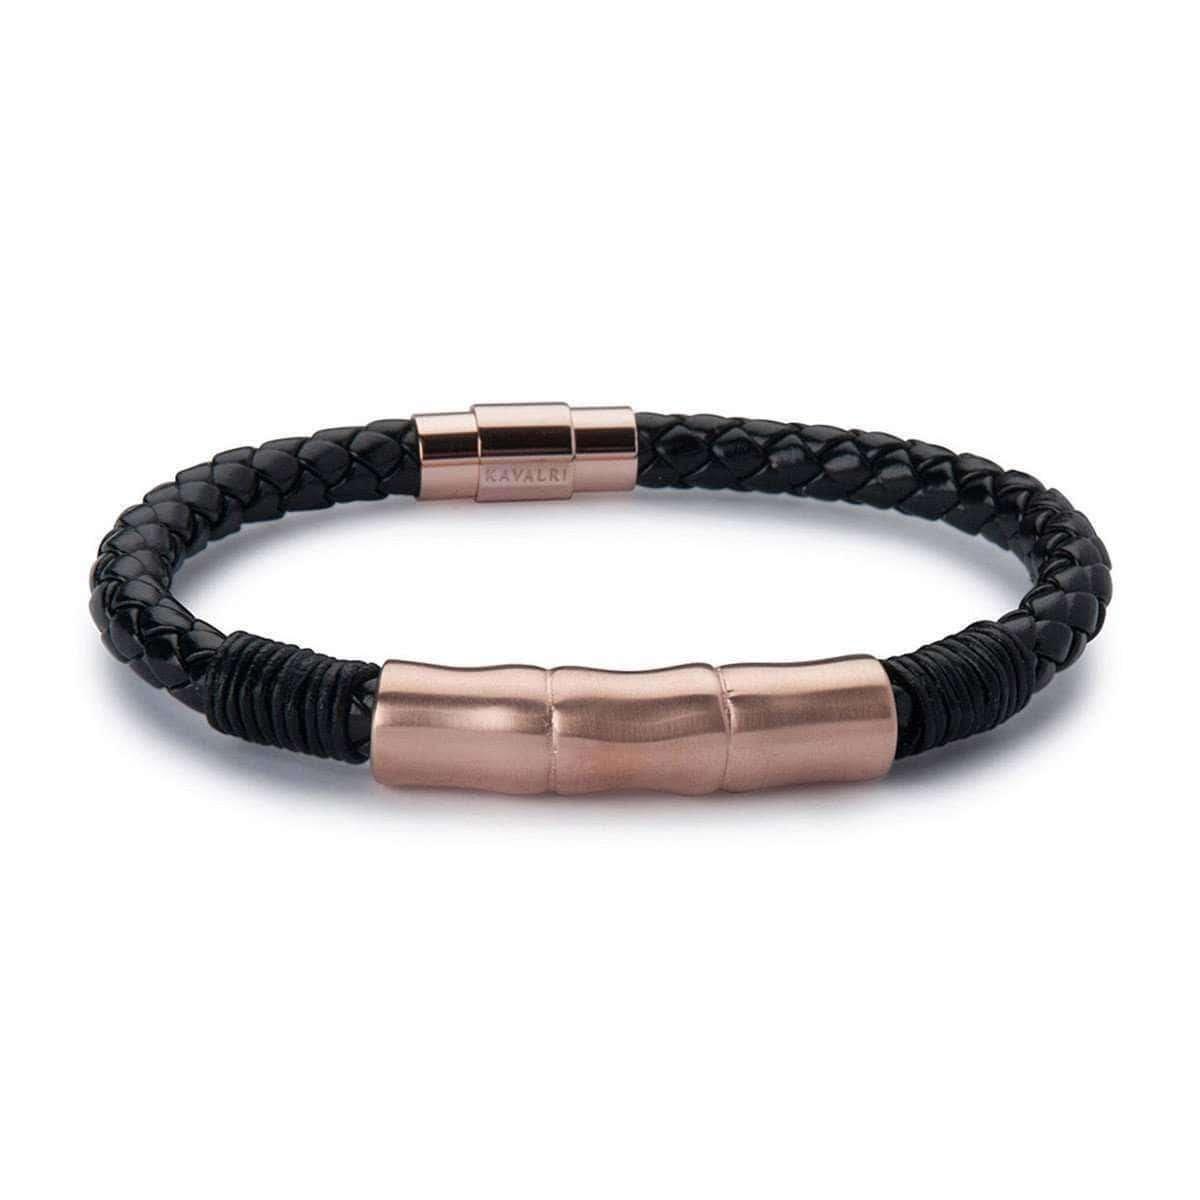 Leather Jawbone Bracelets - Rose Gold